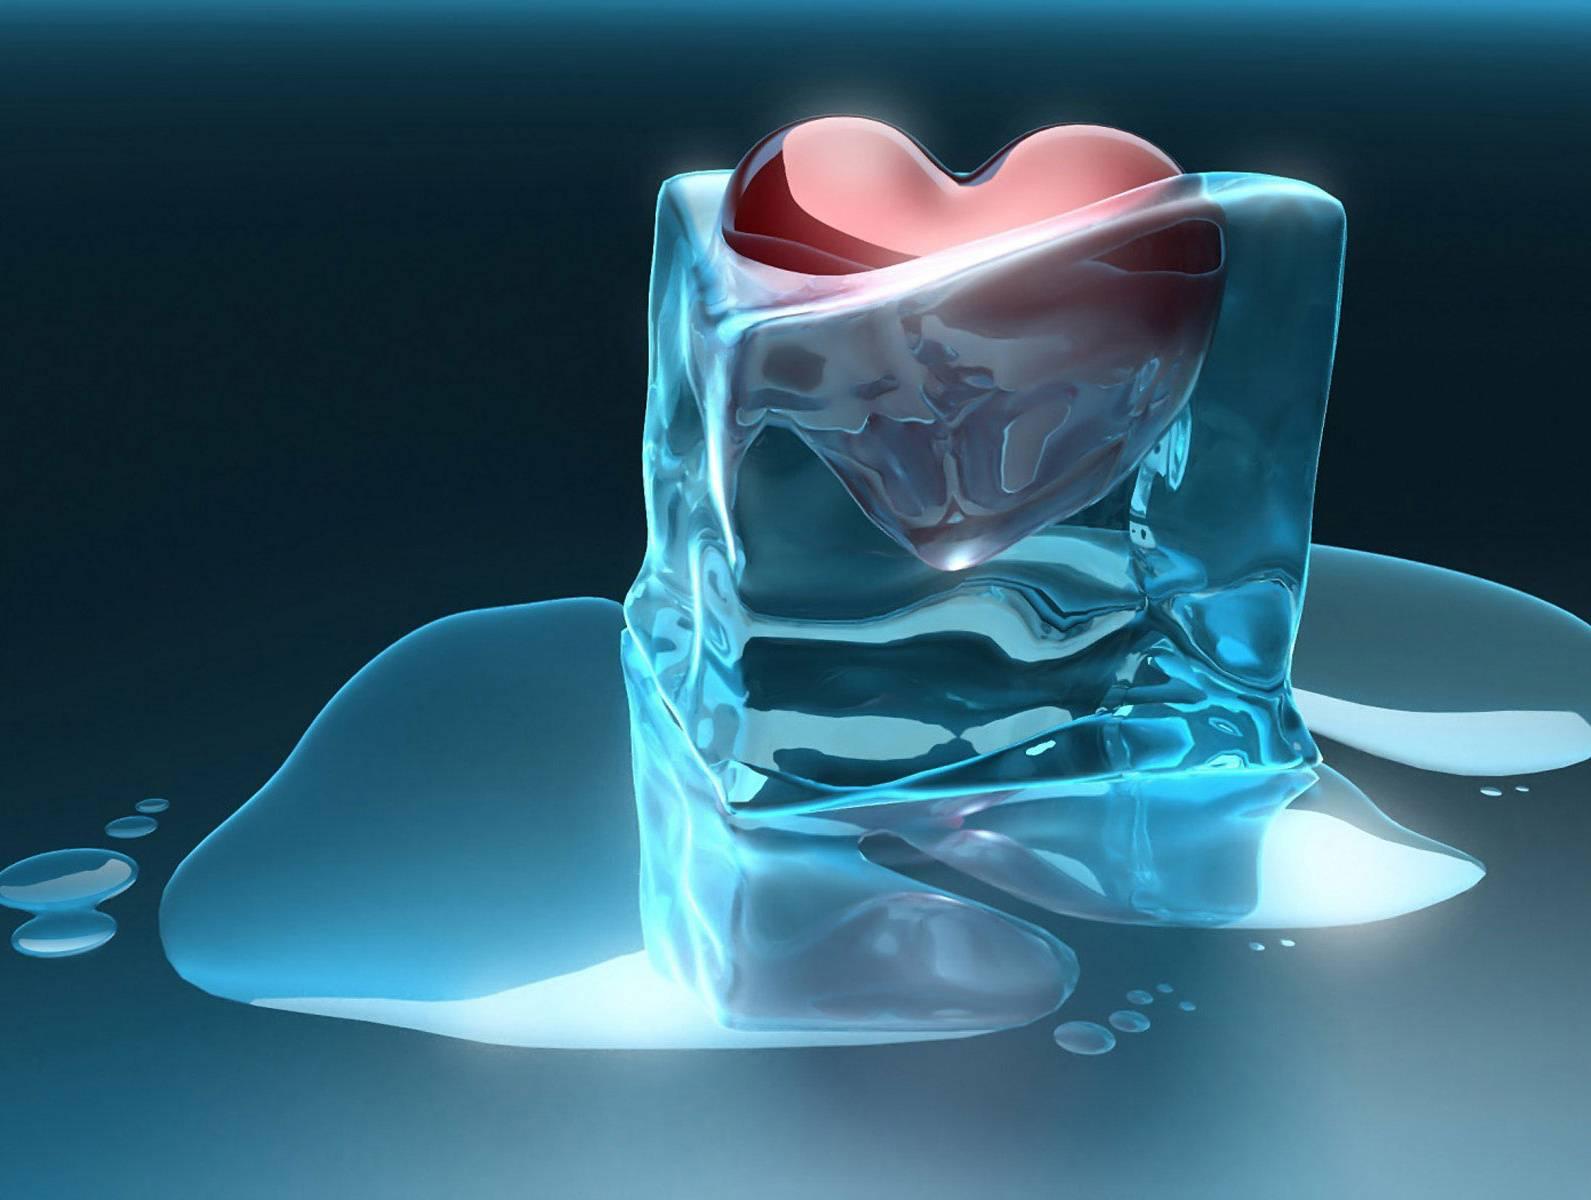 Iceheart